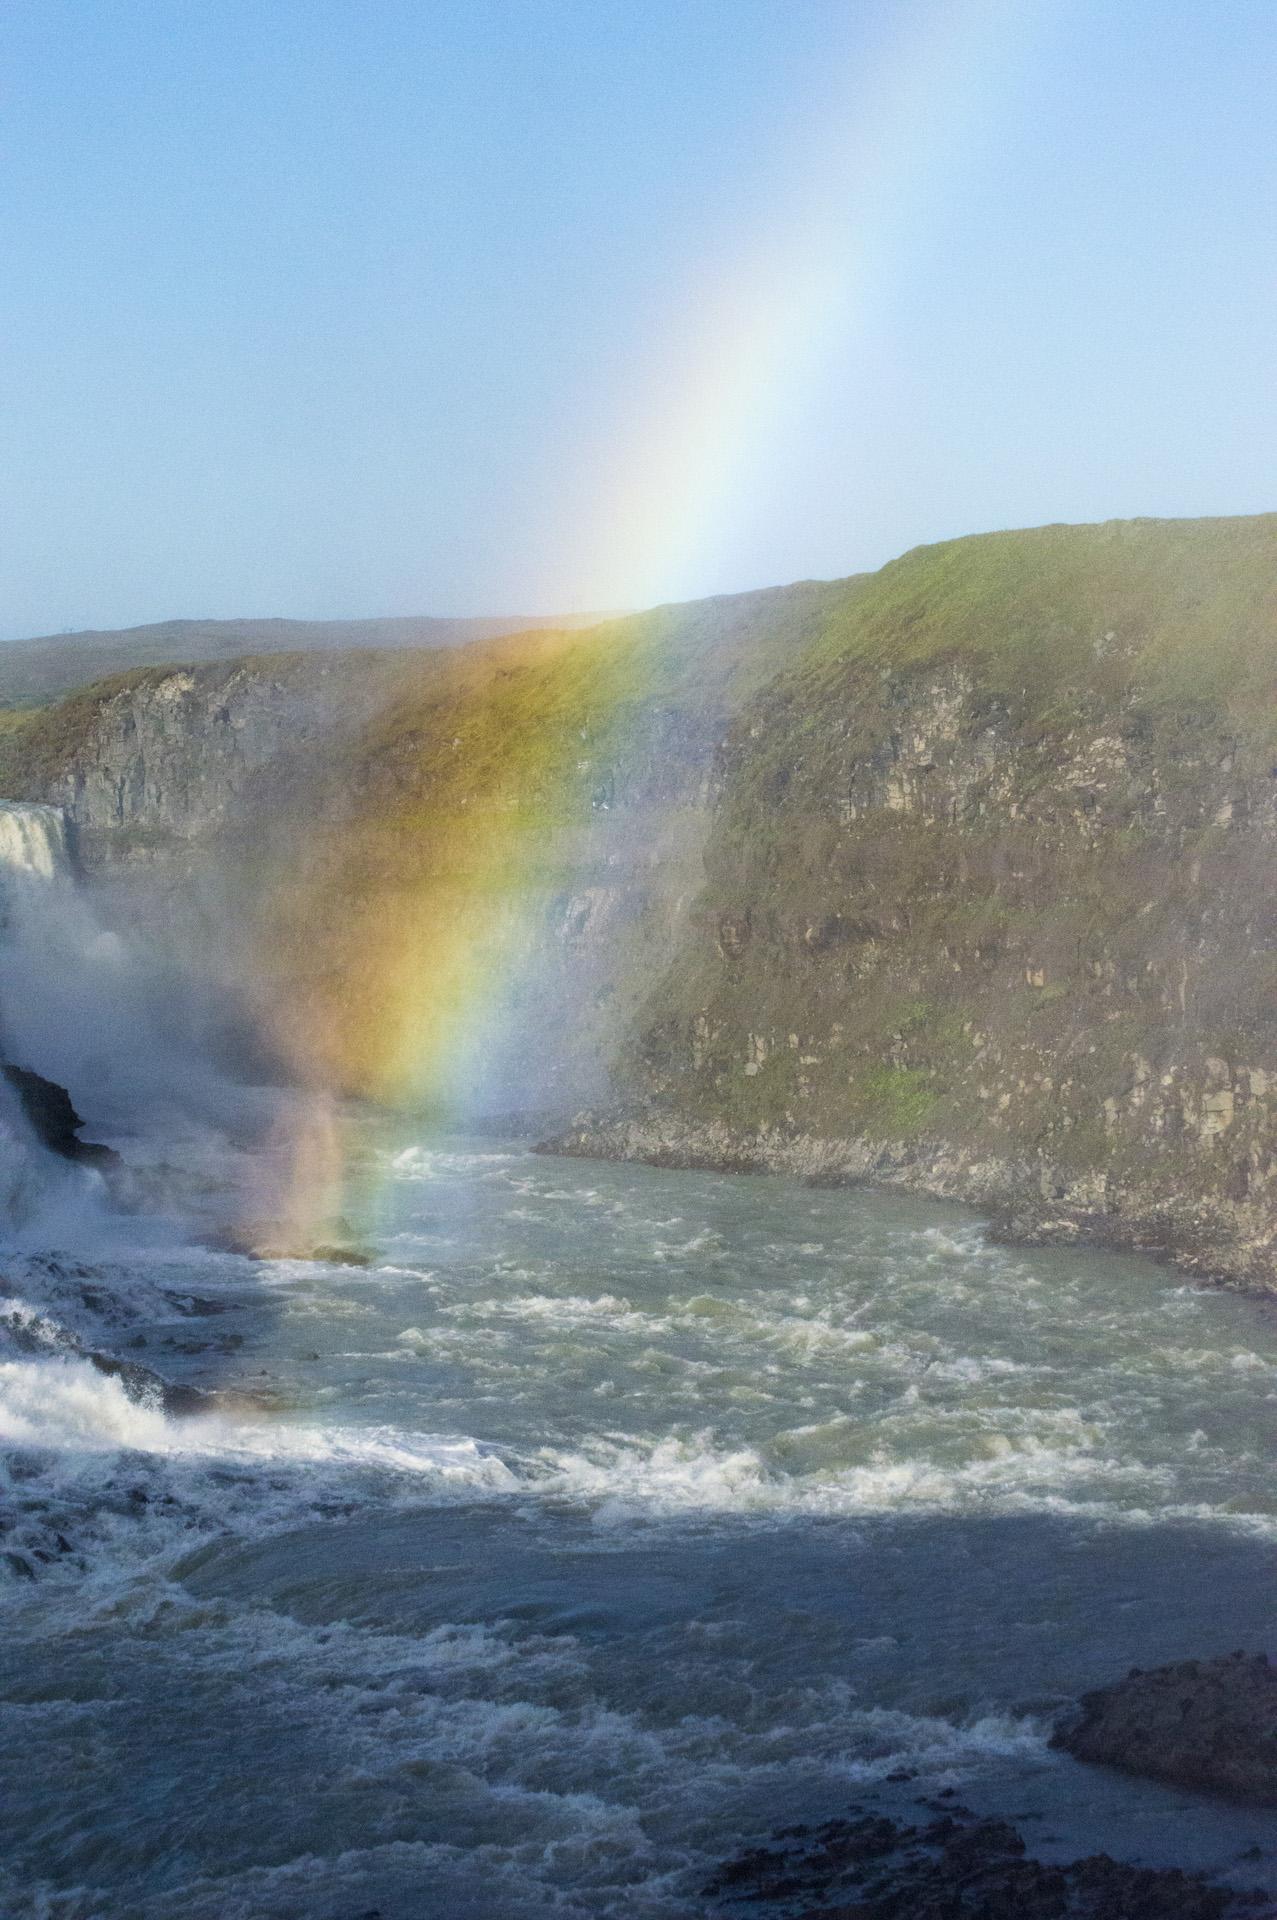 Rainbow extends from Gullfoss waterfall, Suðurland region, Iceland